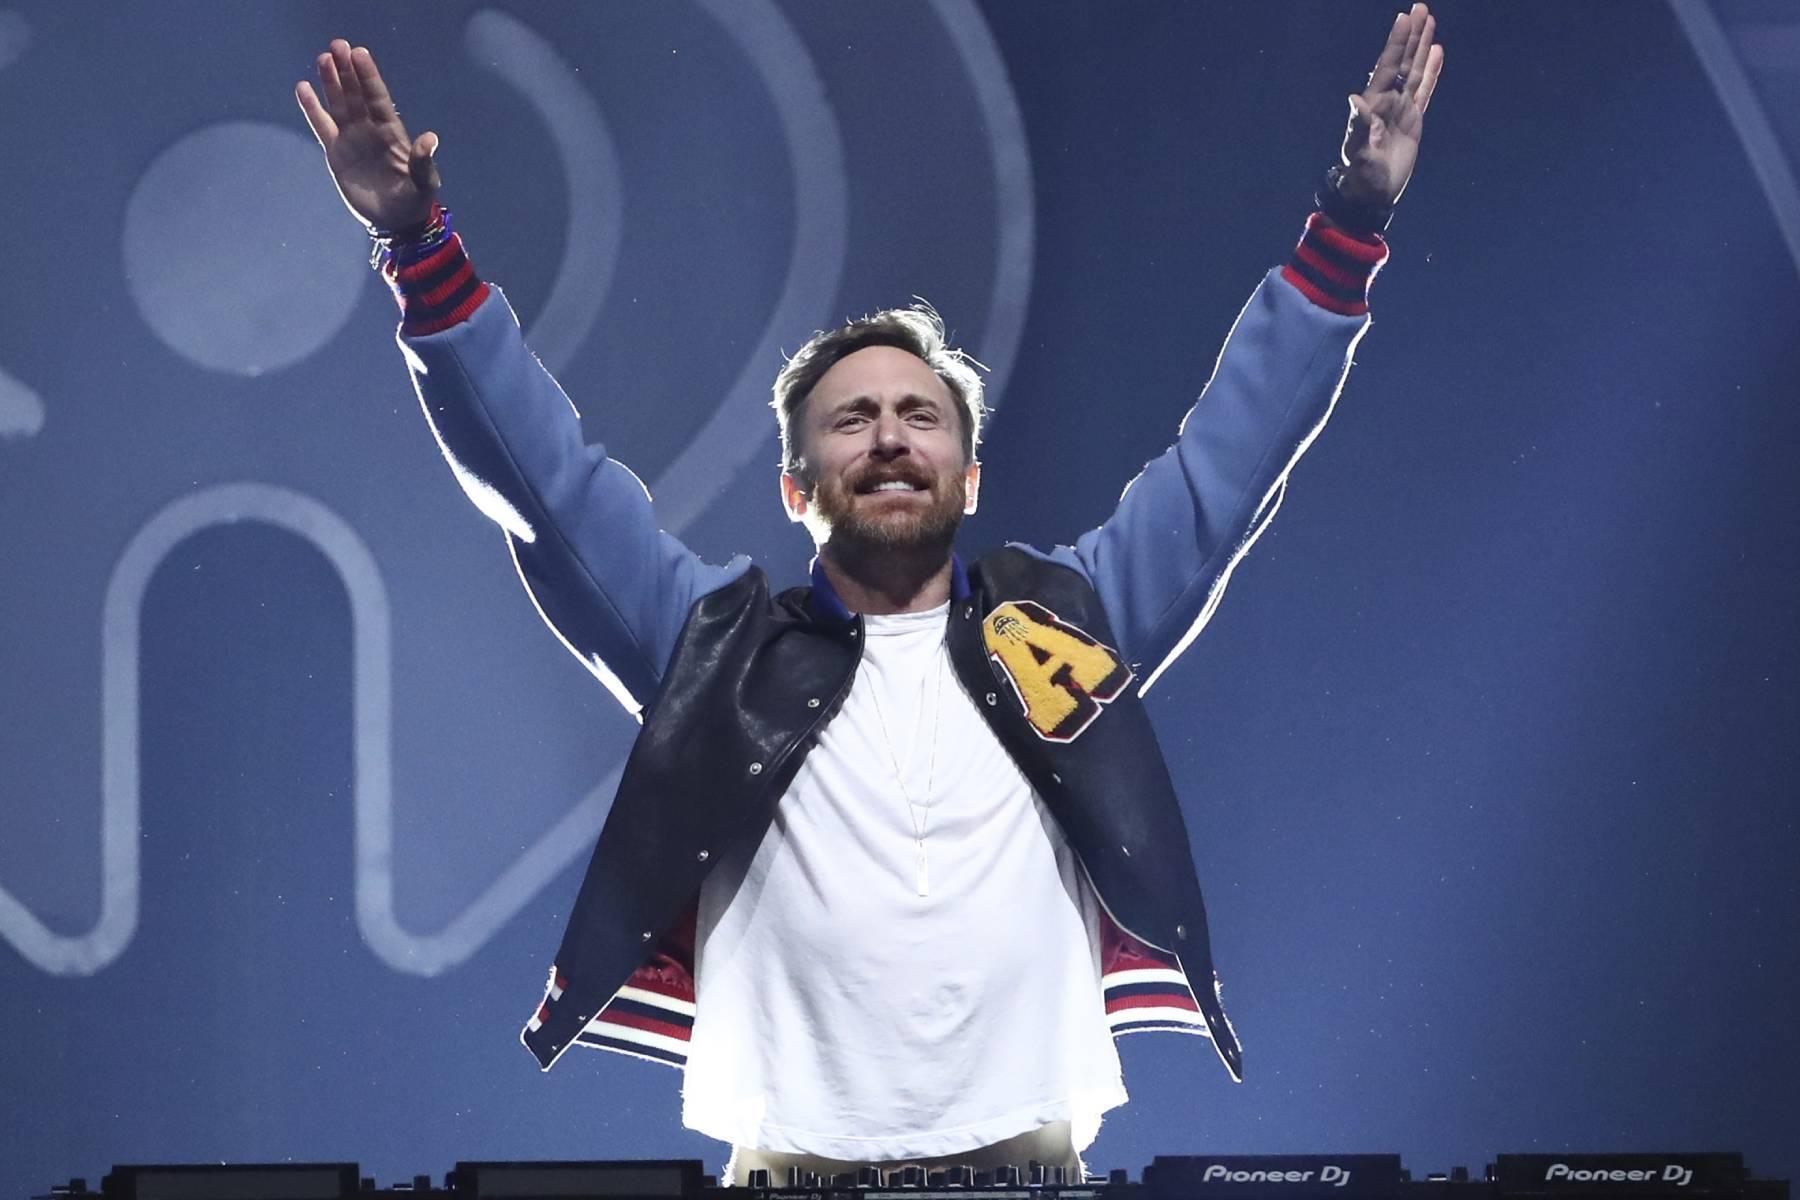 Warner music buys French DJ David Guetta's music catalogue